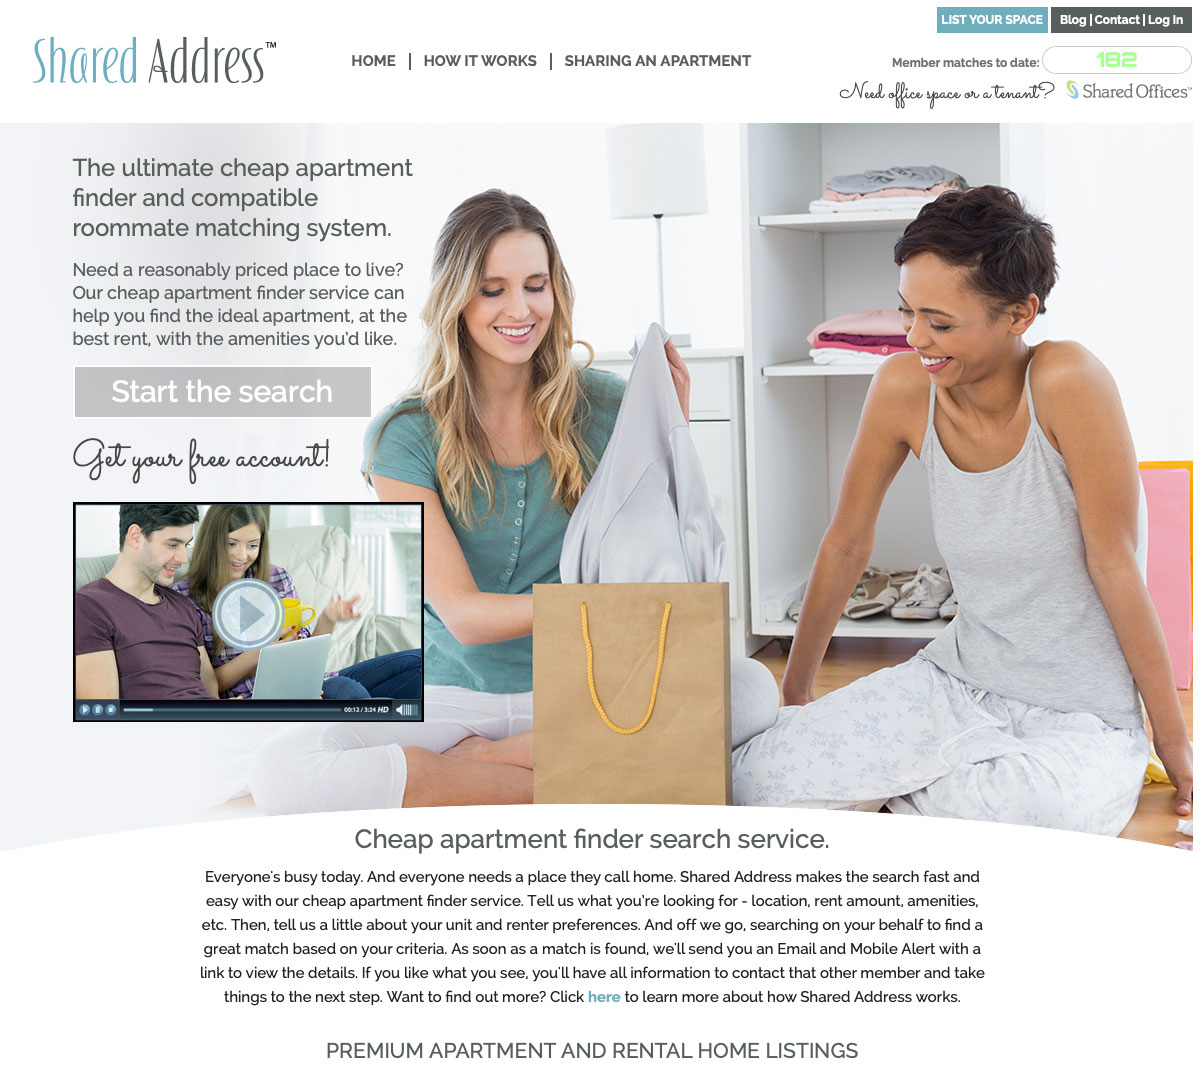 Shared Address Apartment Sharing Website